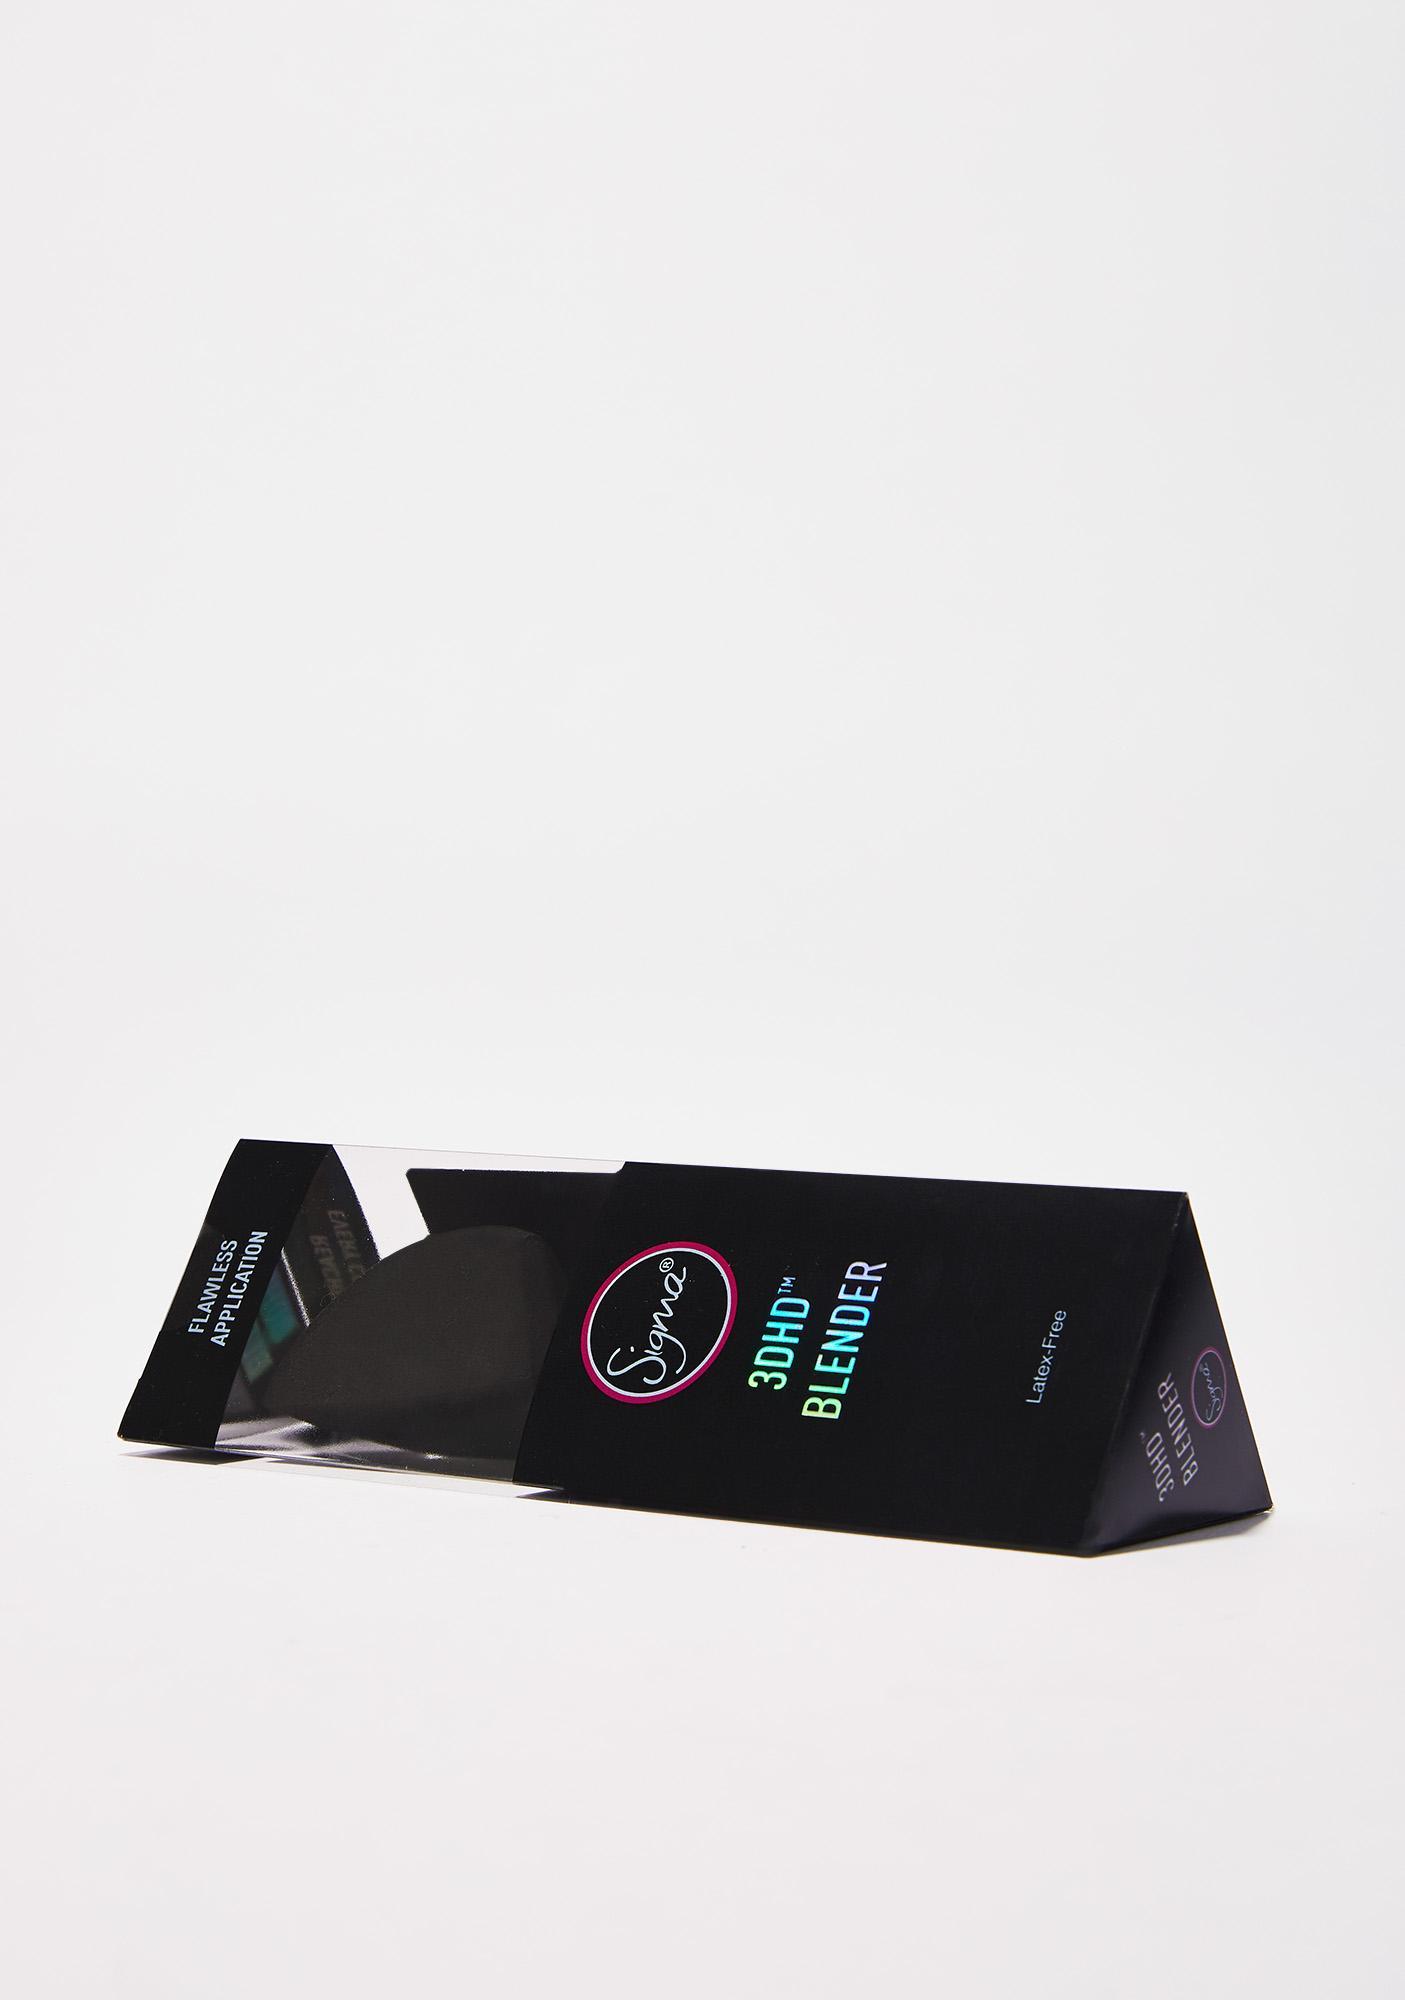 Sigma 3DHD Blender